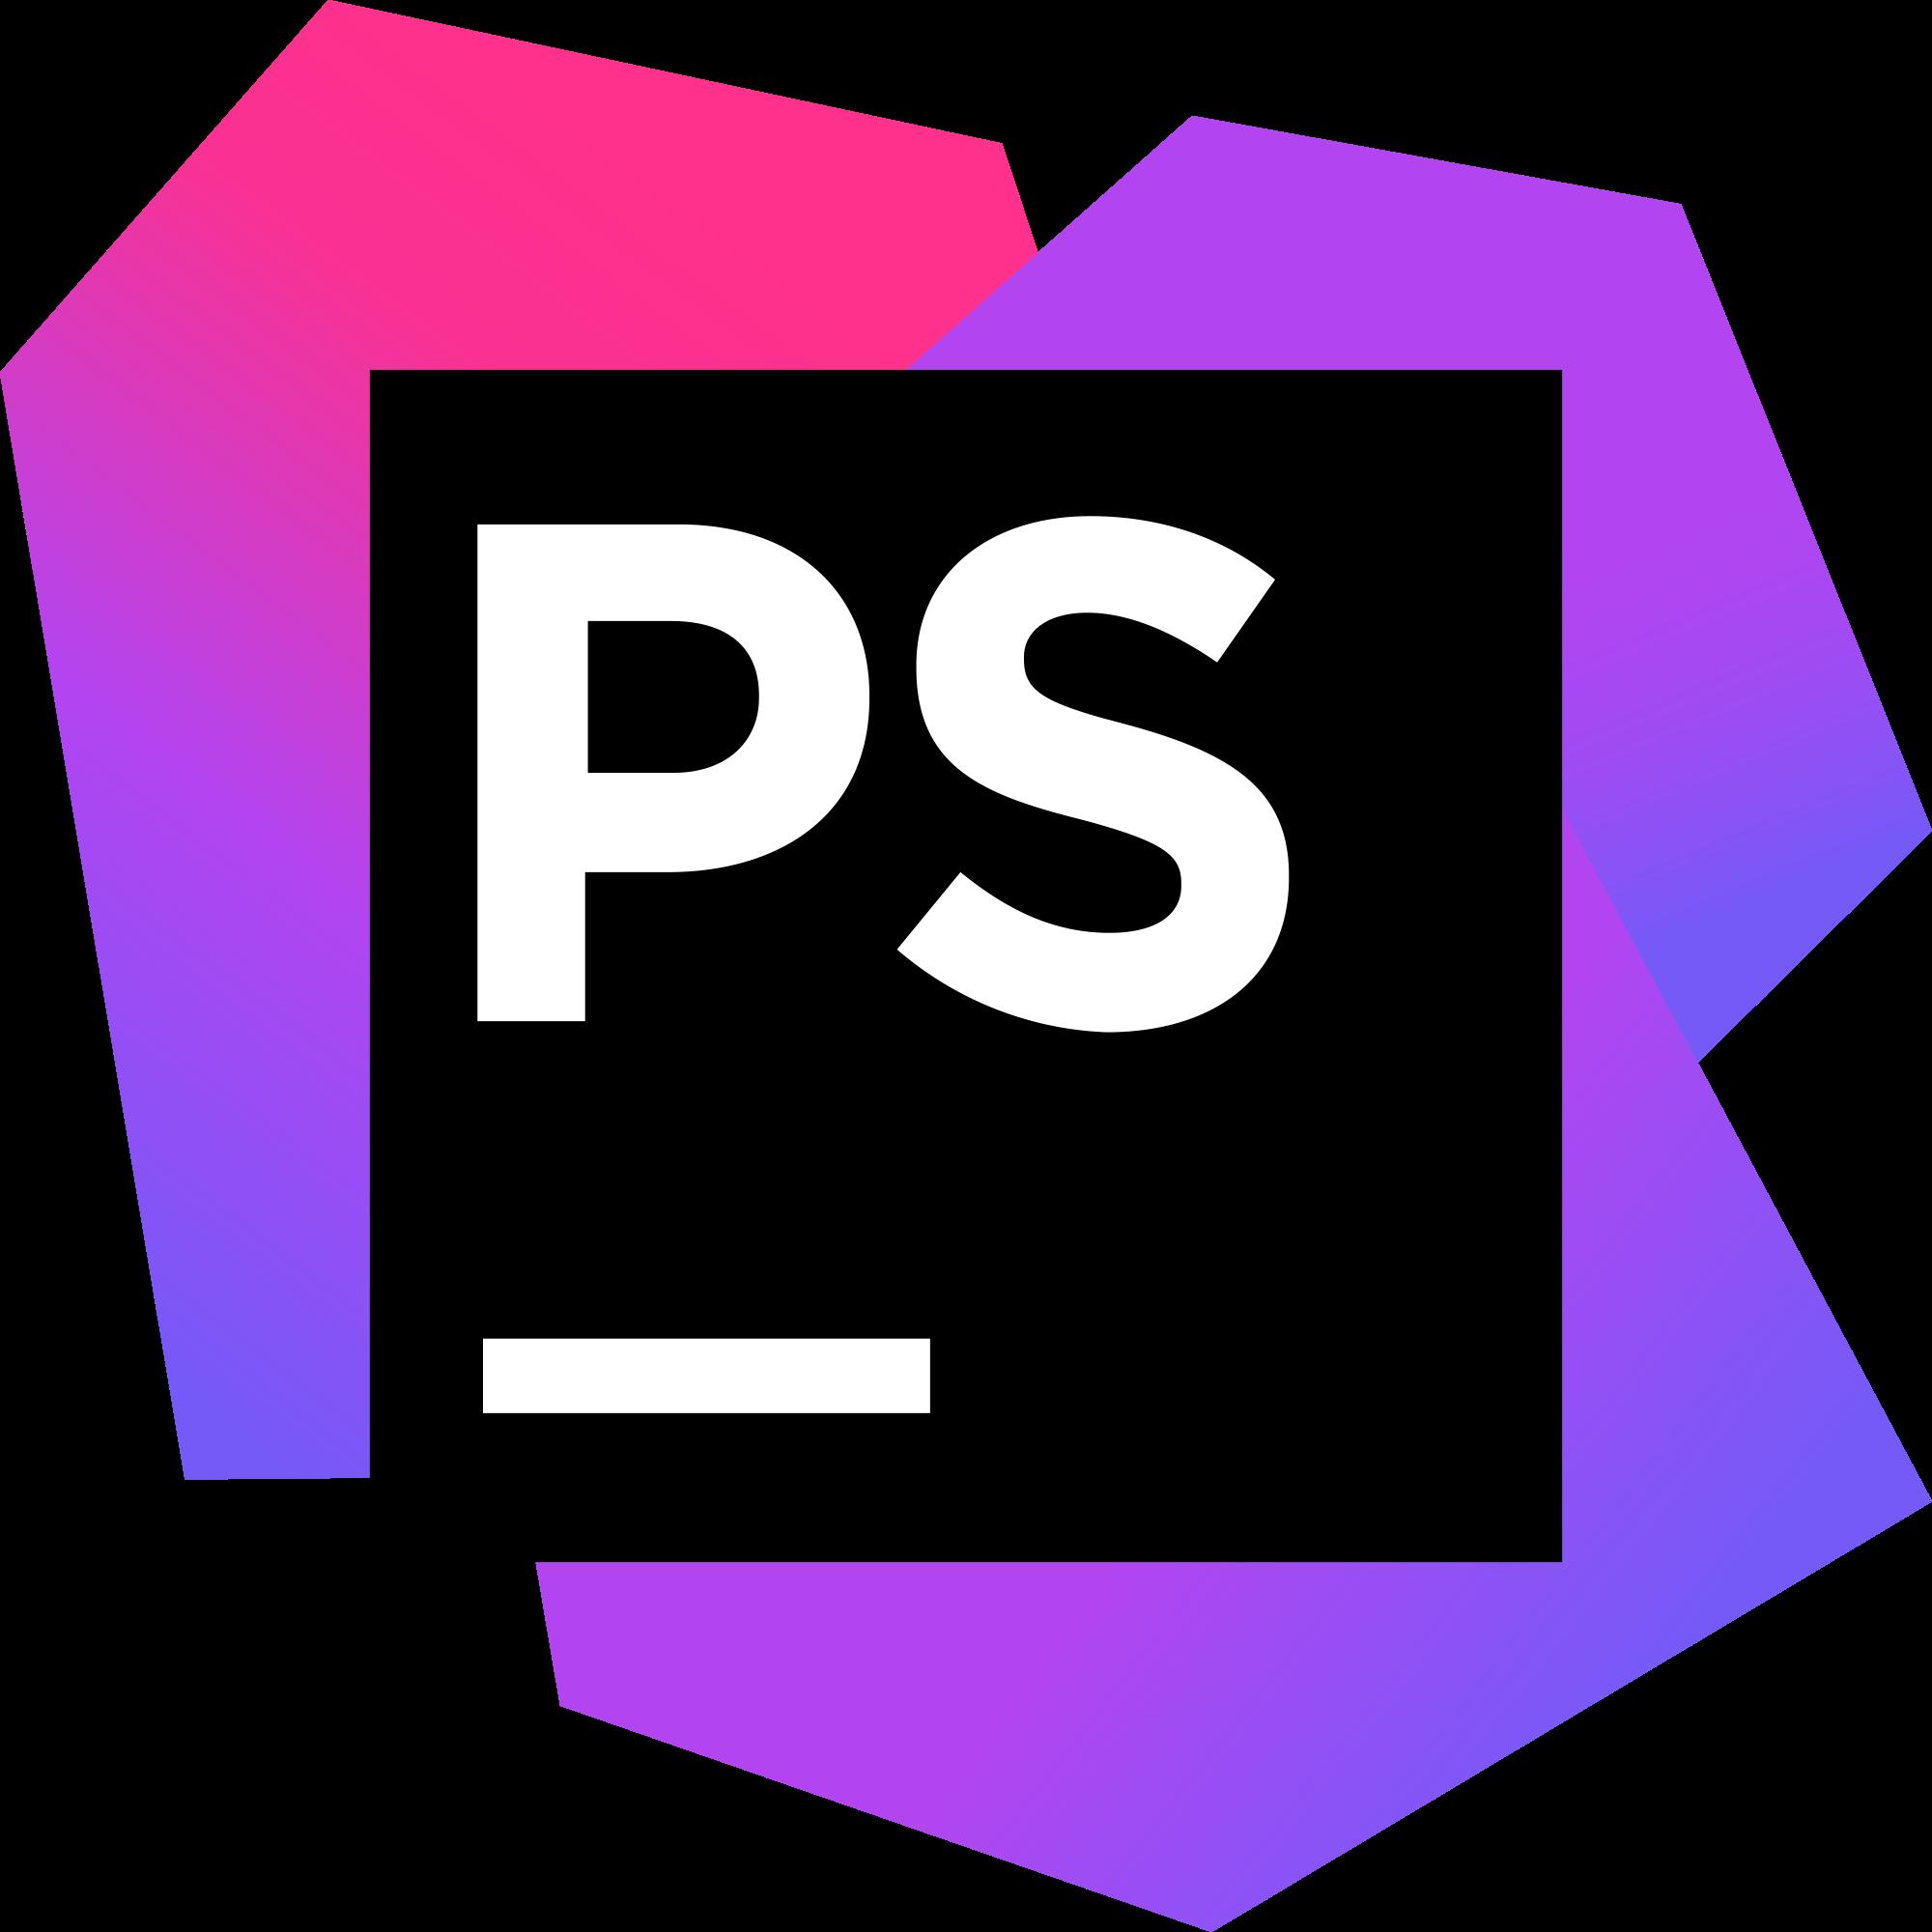 :phpstorm: